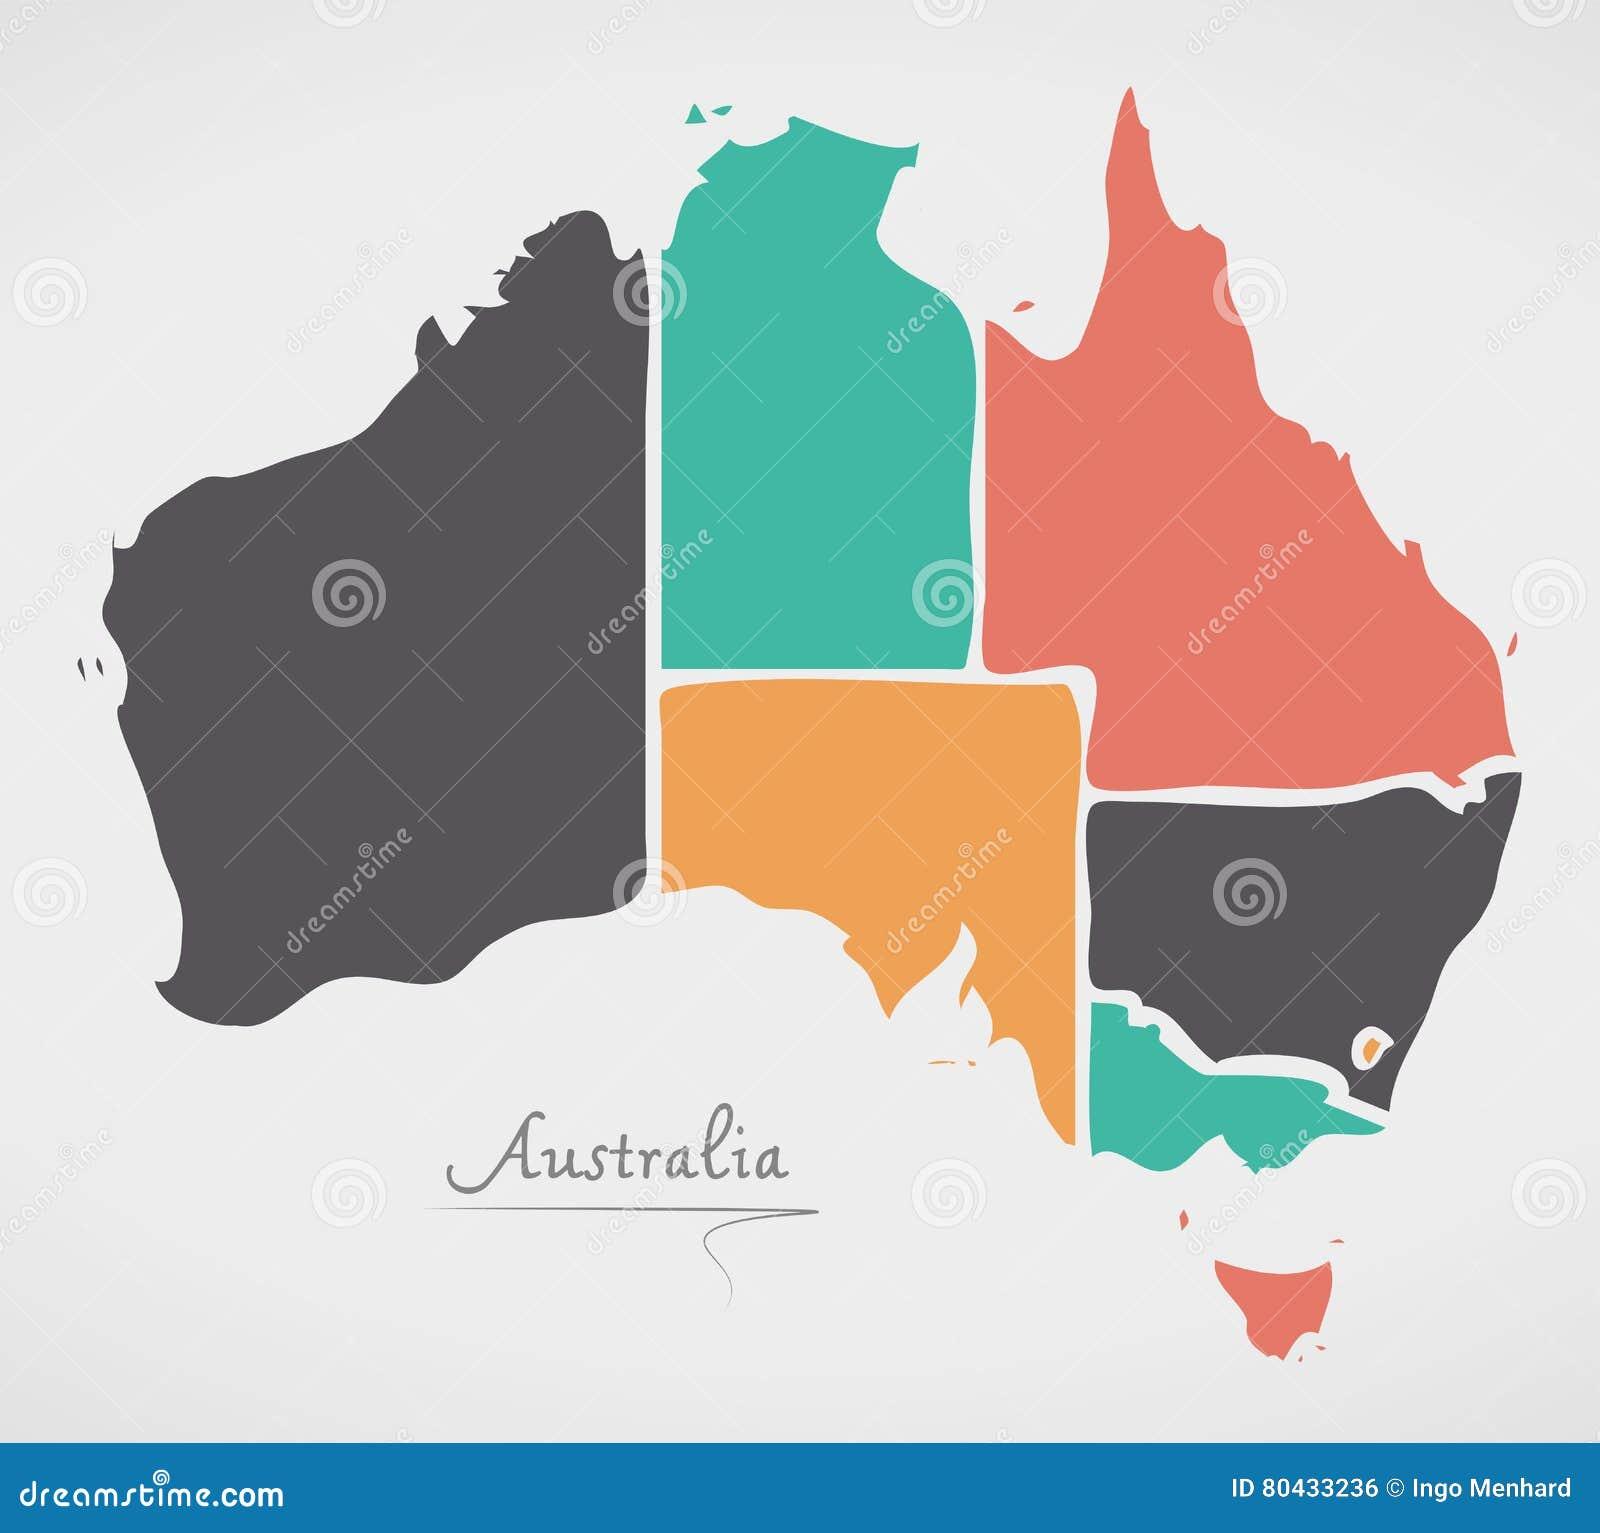 Australia Map Shape.Australia Map With Modern Round Shapes Stock Illustration